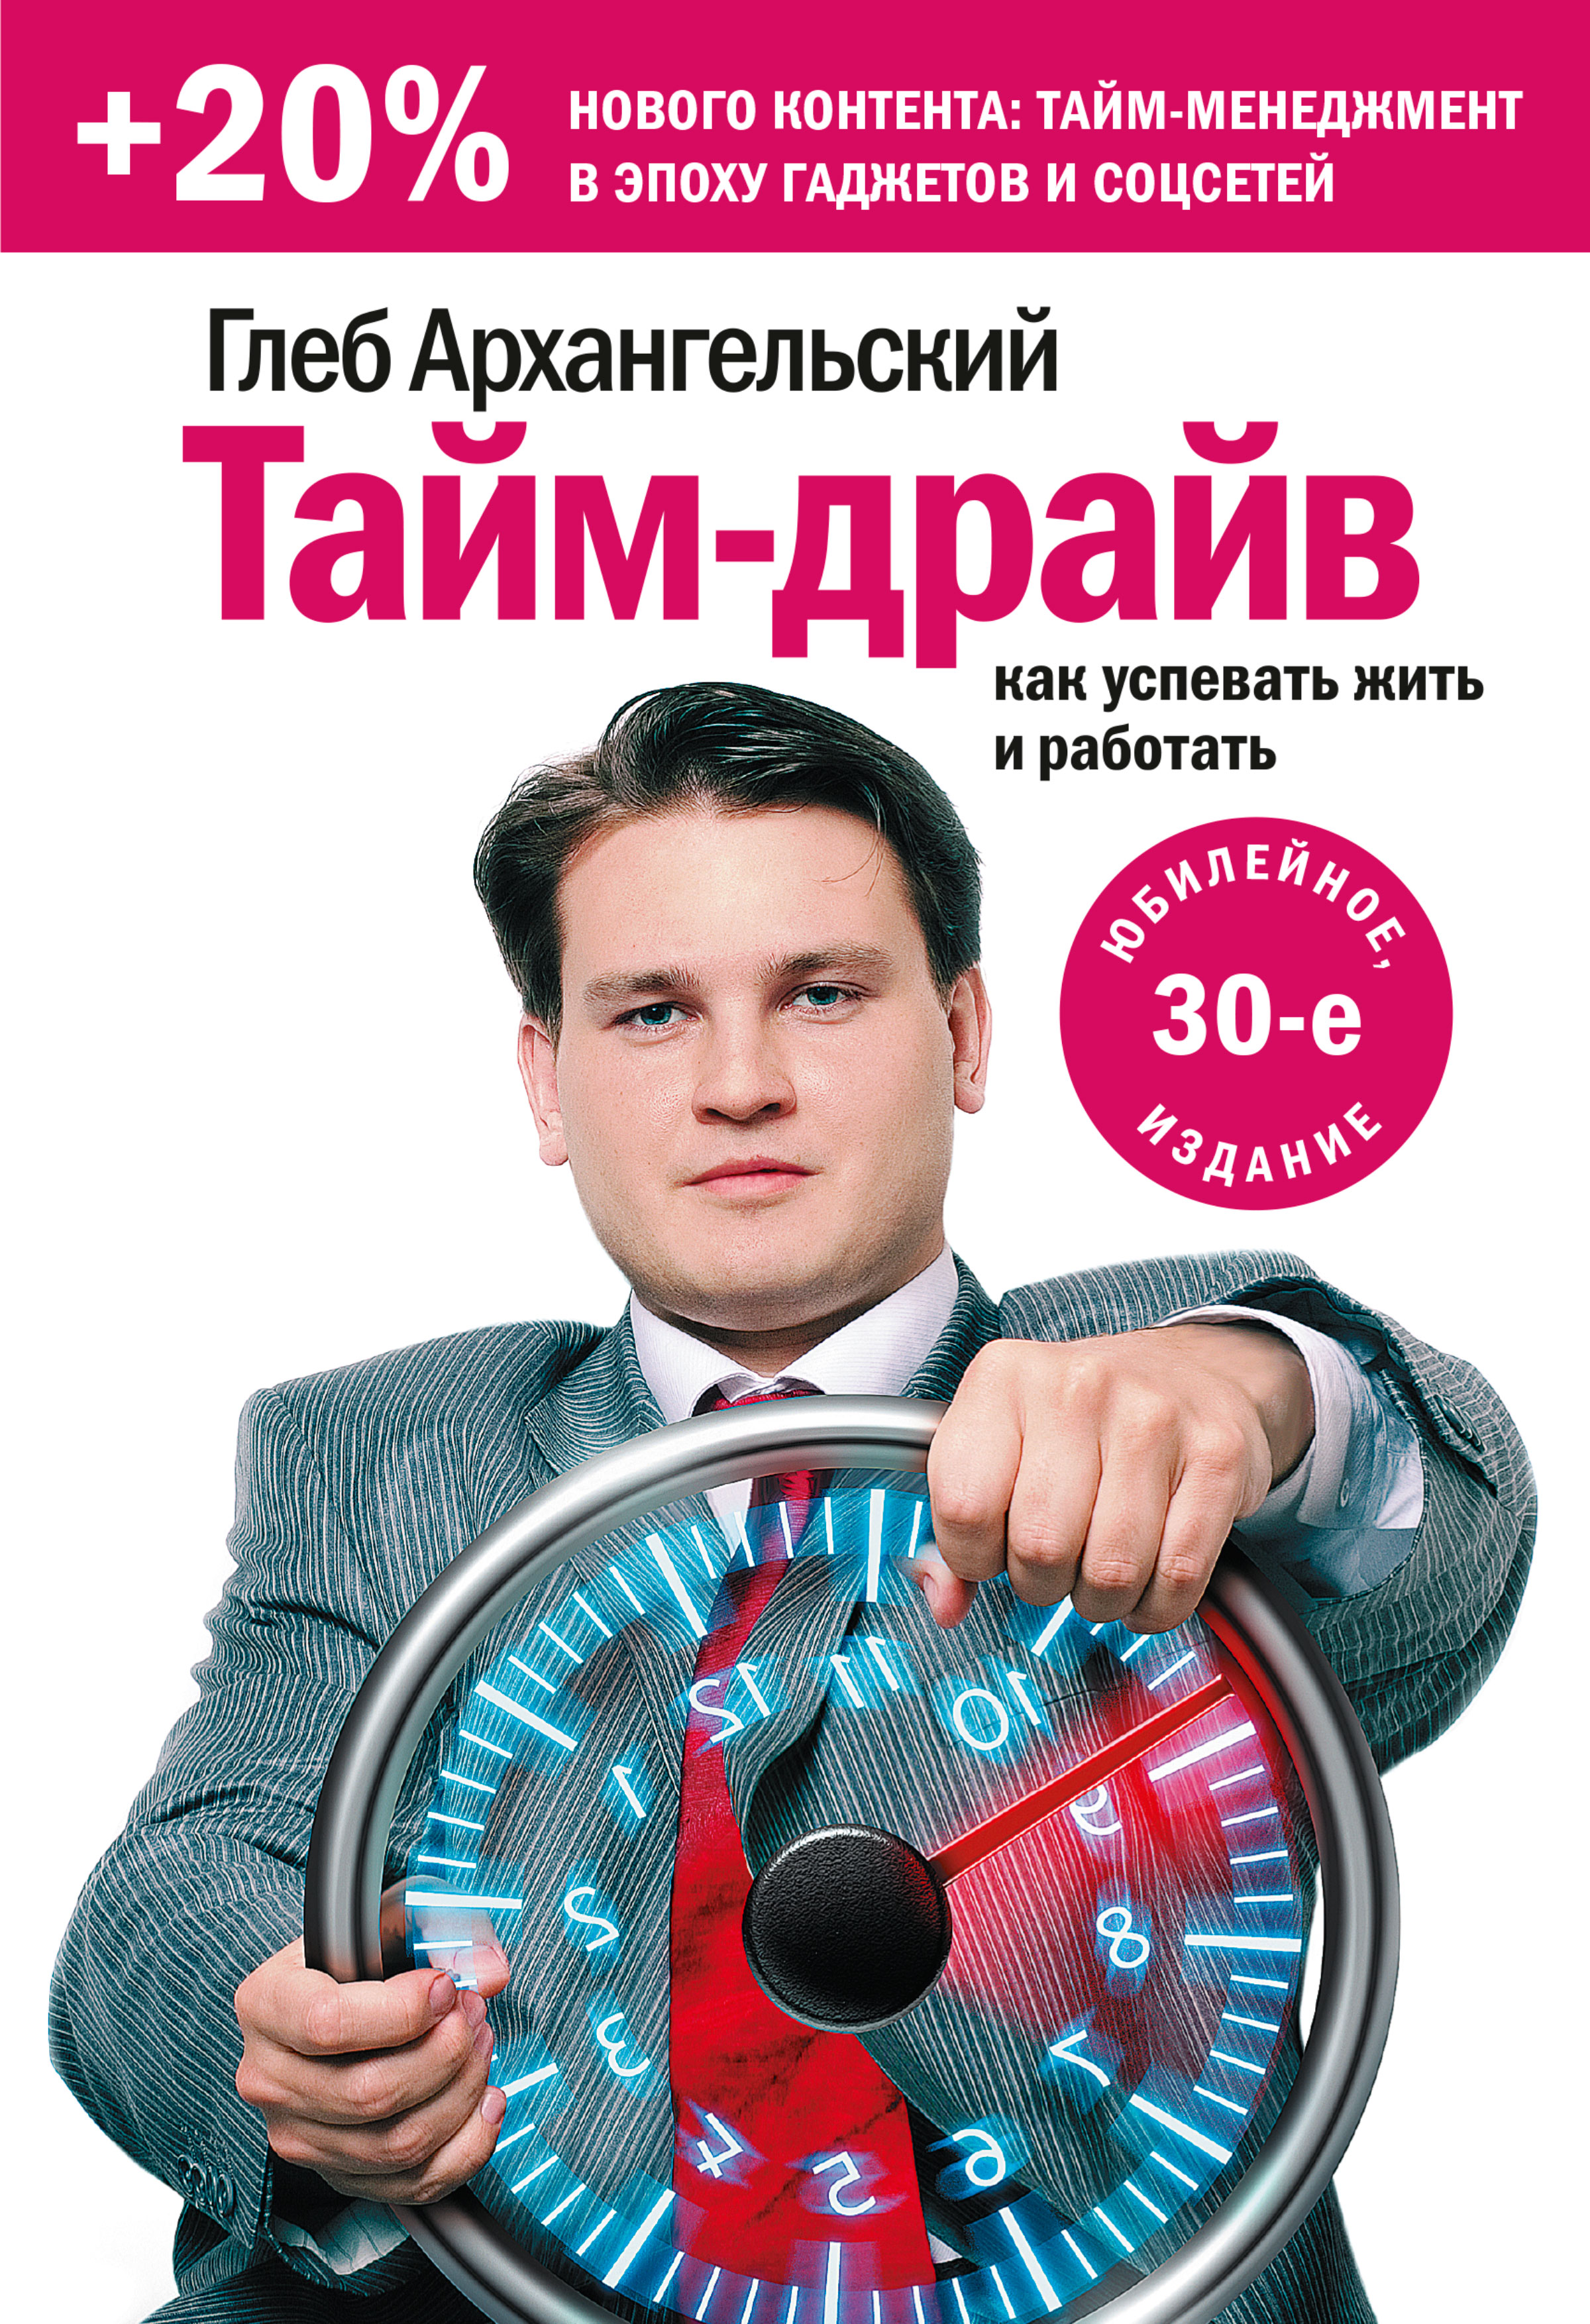 Глеб Архангельский Тайм-драйв